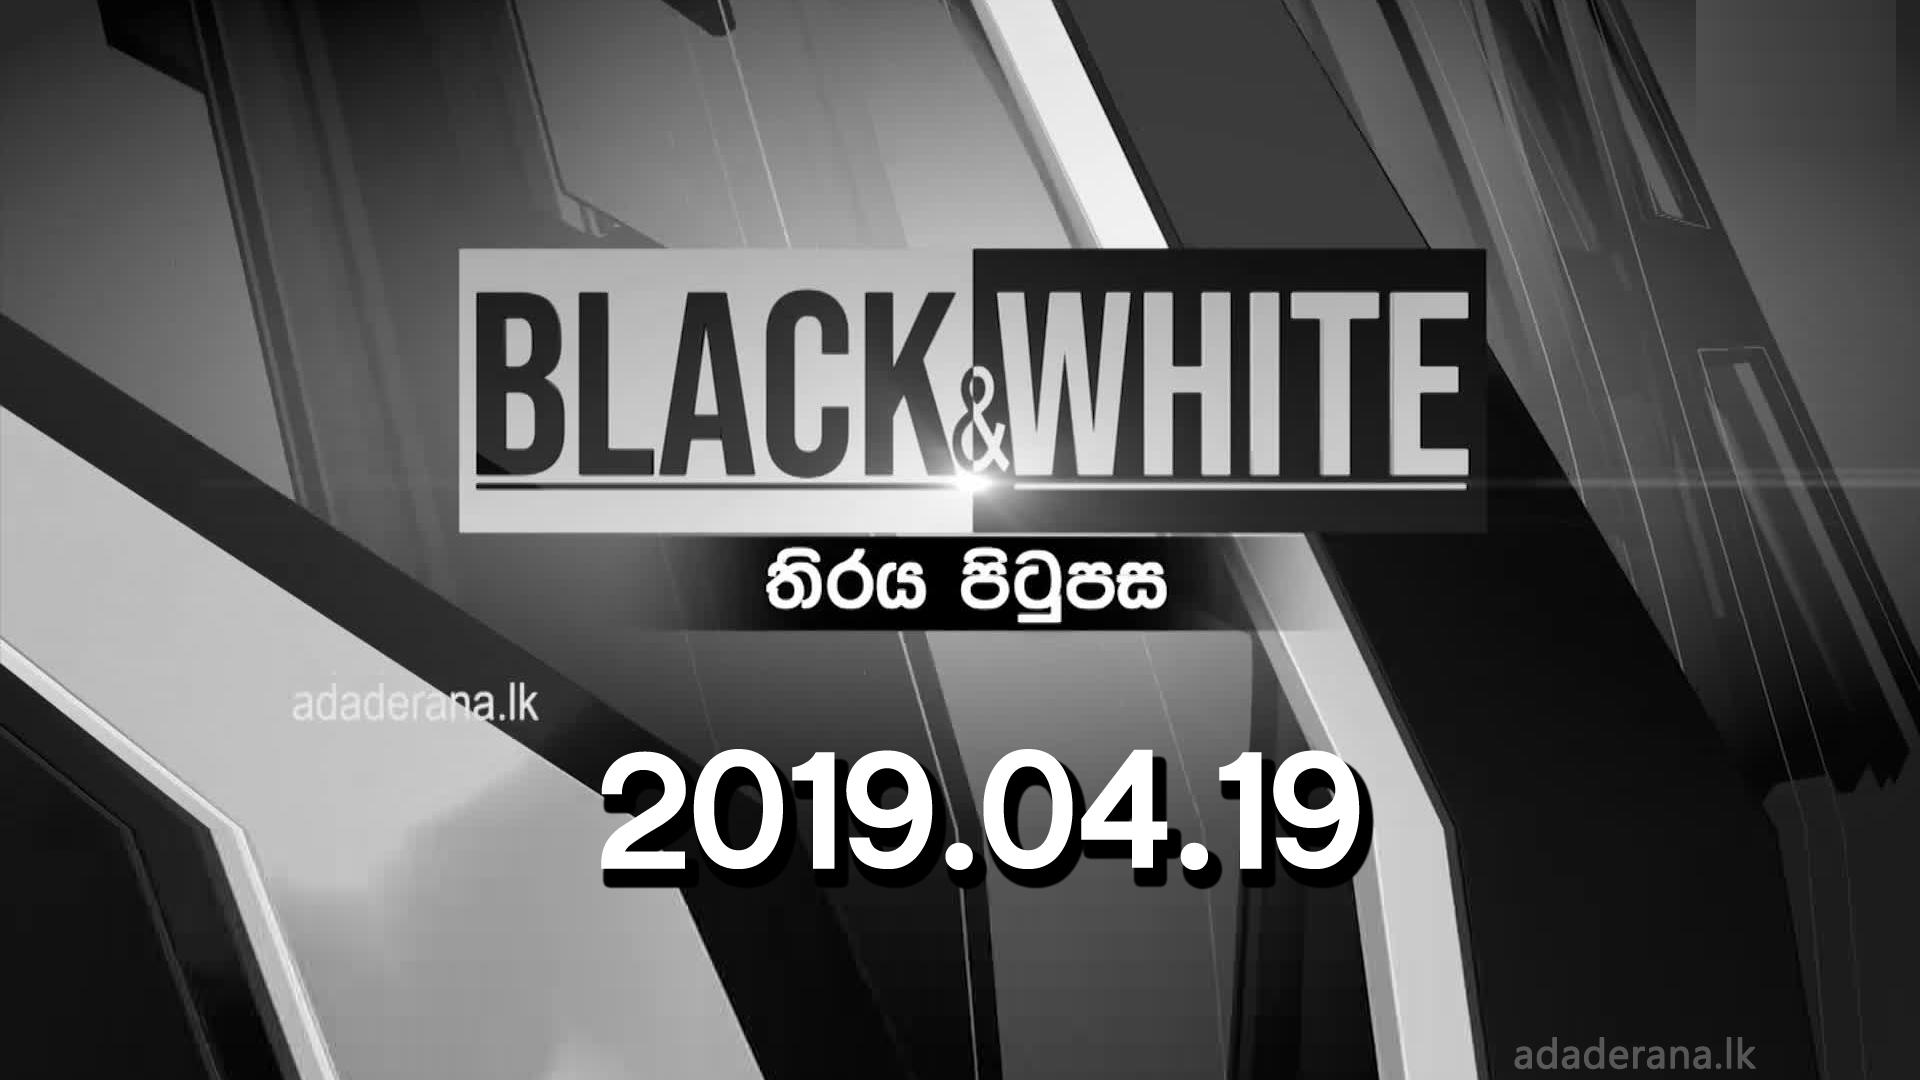 Ada Derana Black & White - 2019.04.19